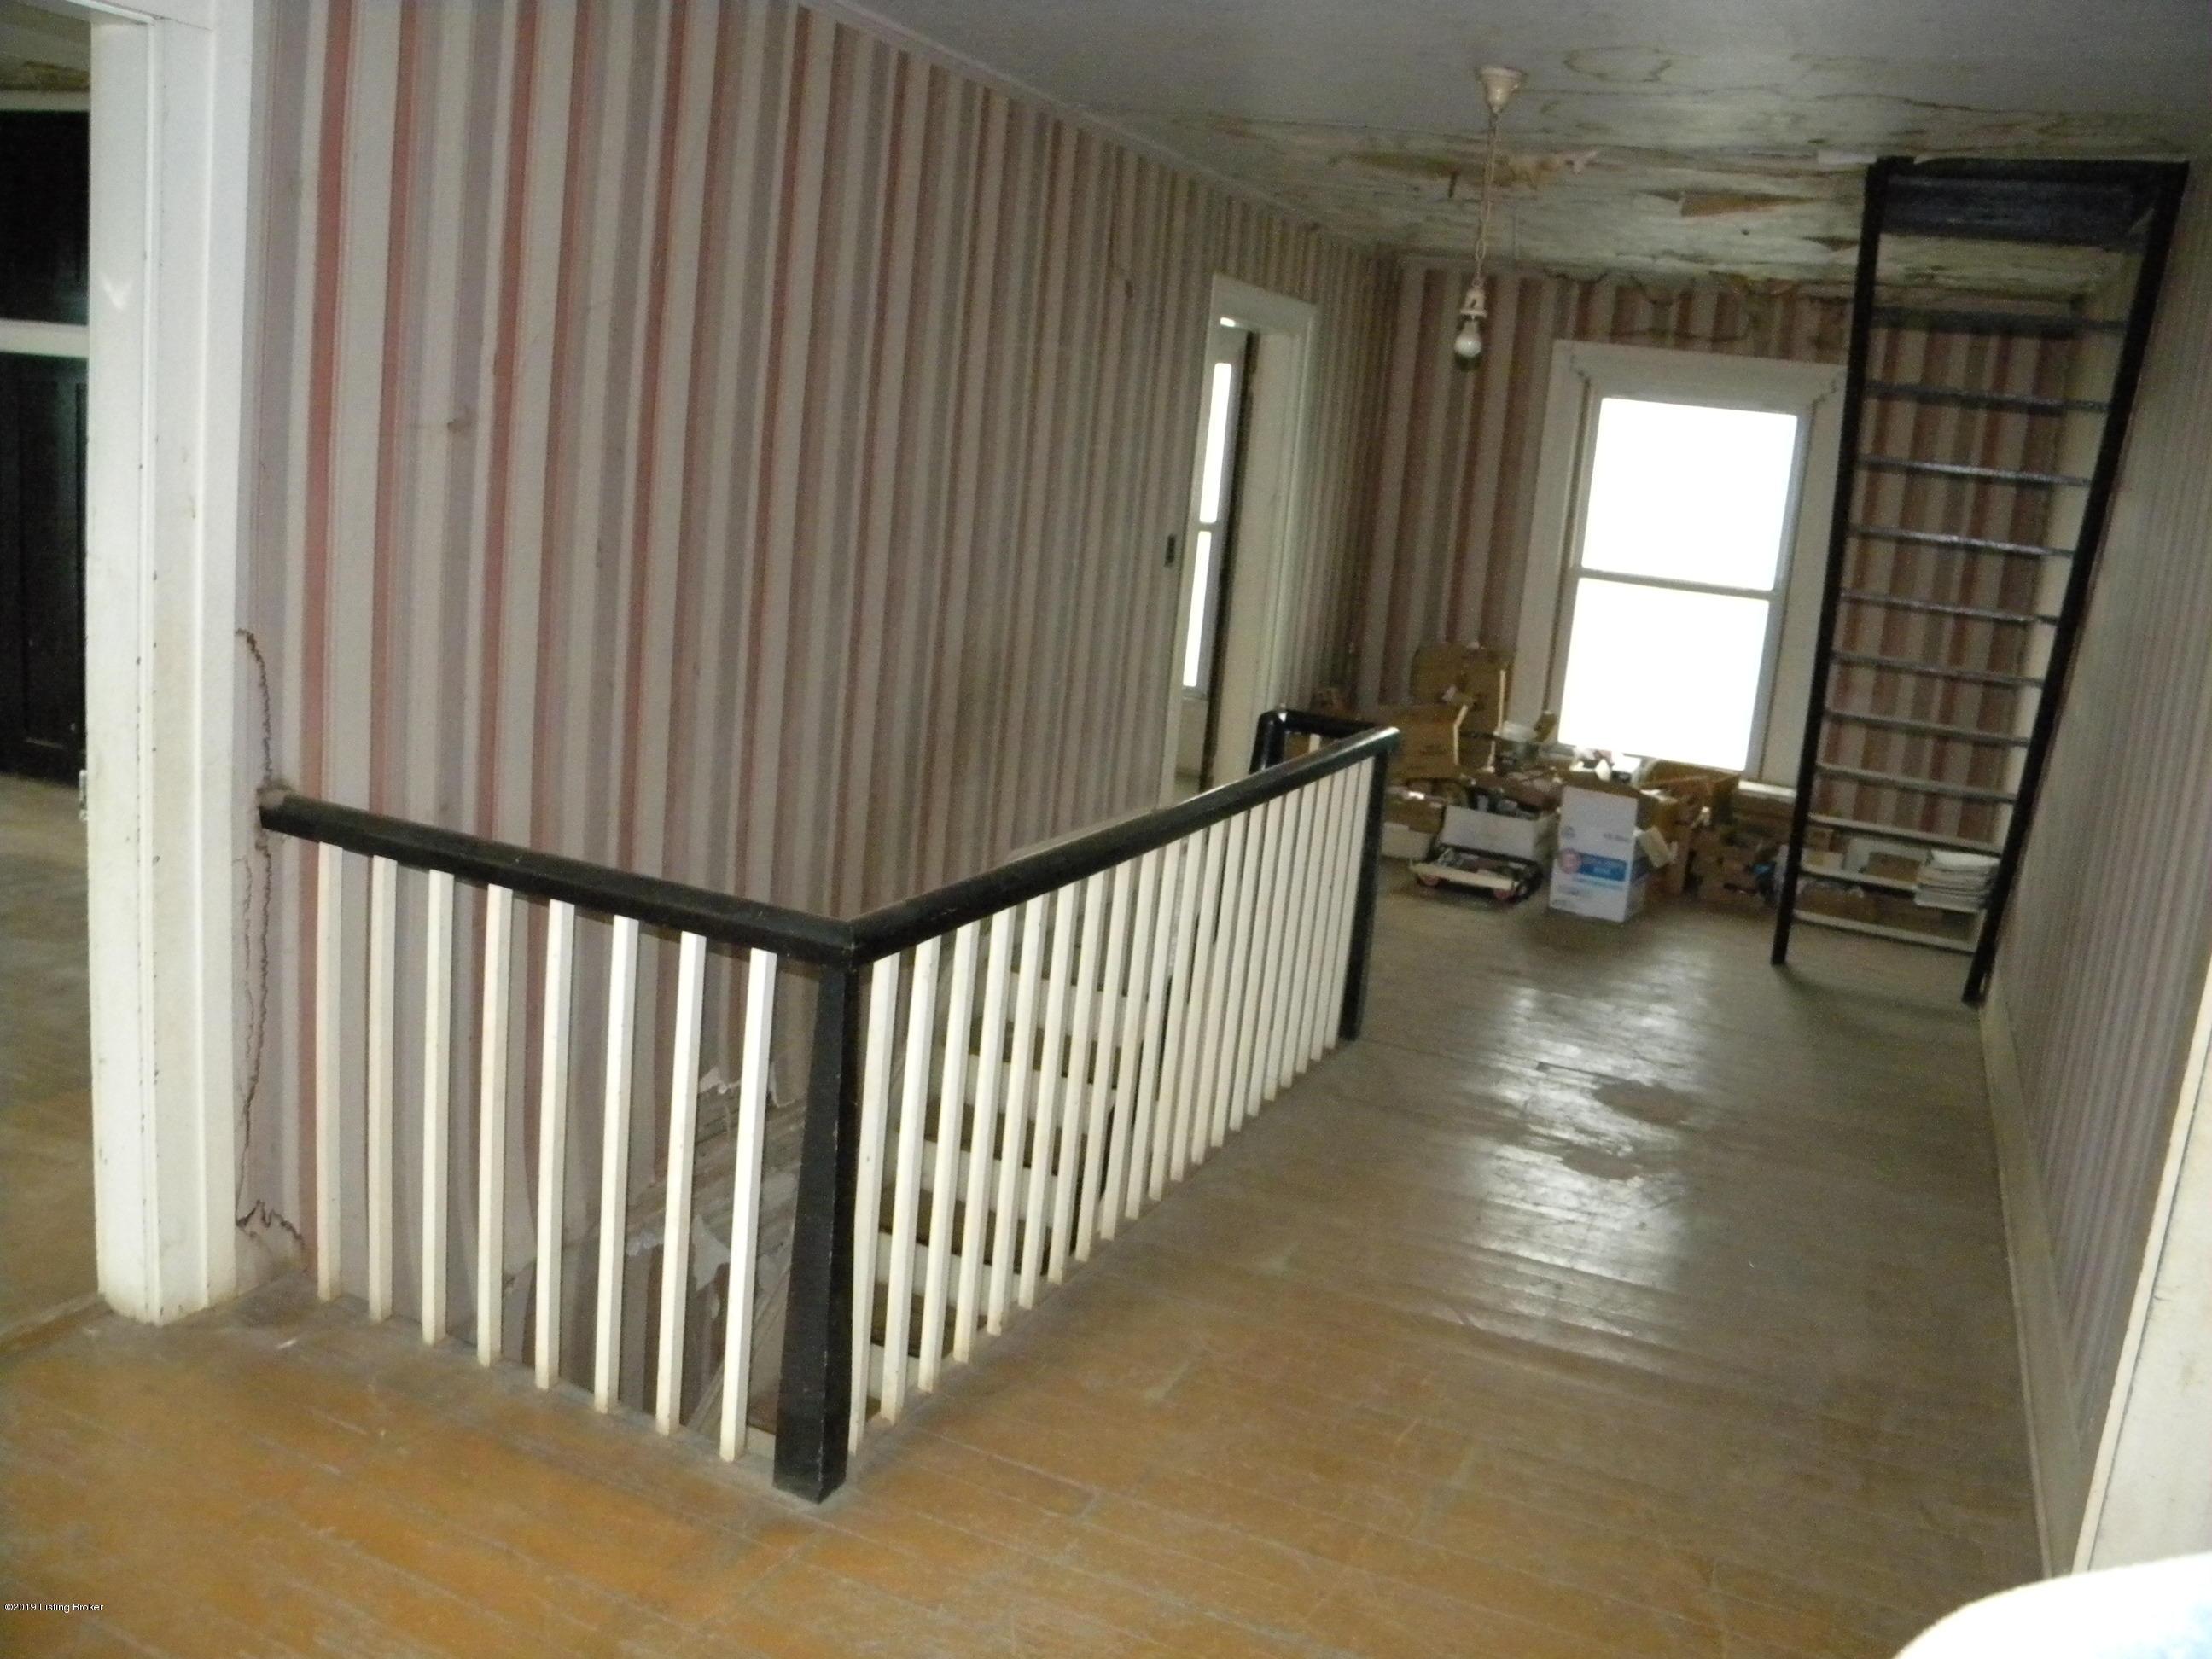 6023 Mt Washington Rd, Taylorsville, Kentucky 40071, 5 Bedrooms Bedrooms, 8 Rooms Rooms,1 BathroomBathrooms,Residential,For Sale,Mt Washington,1524874